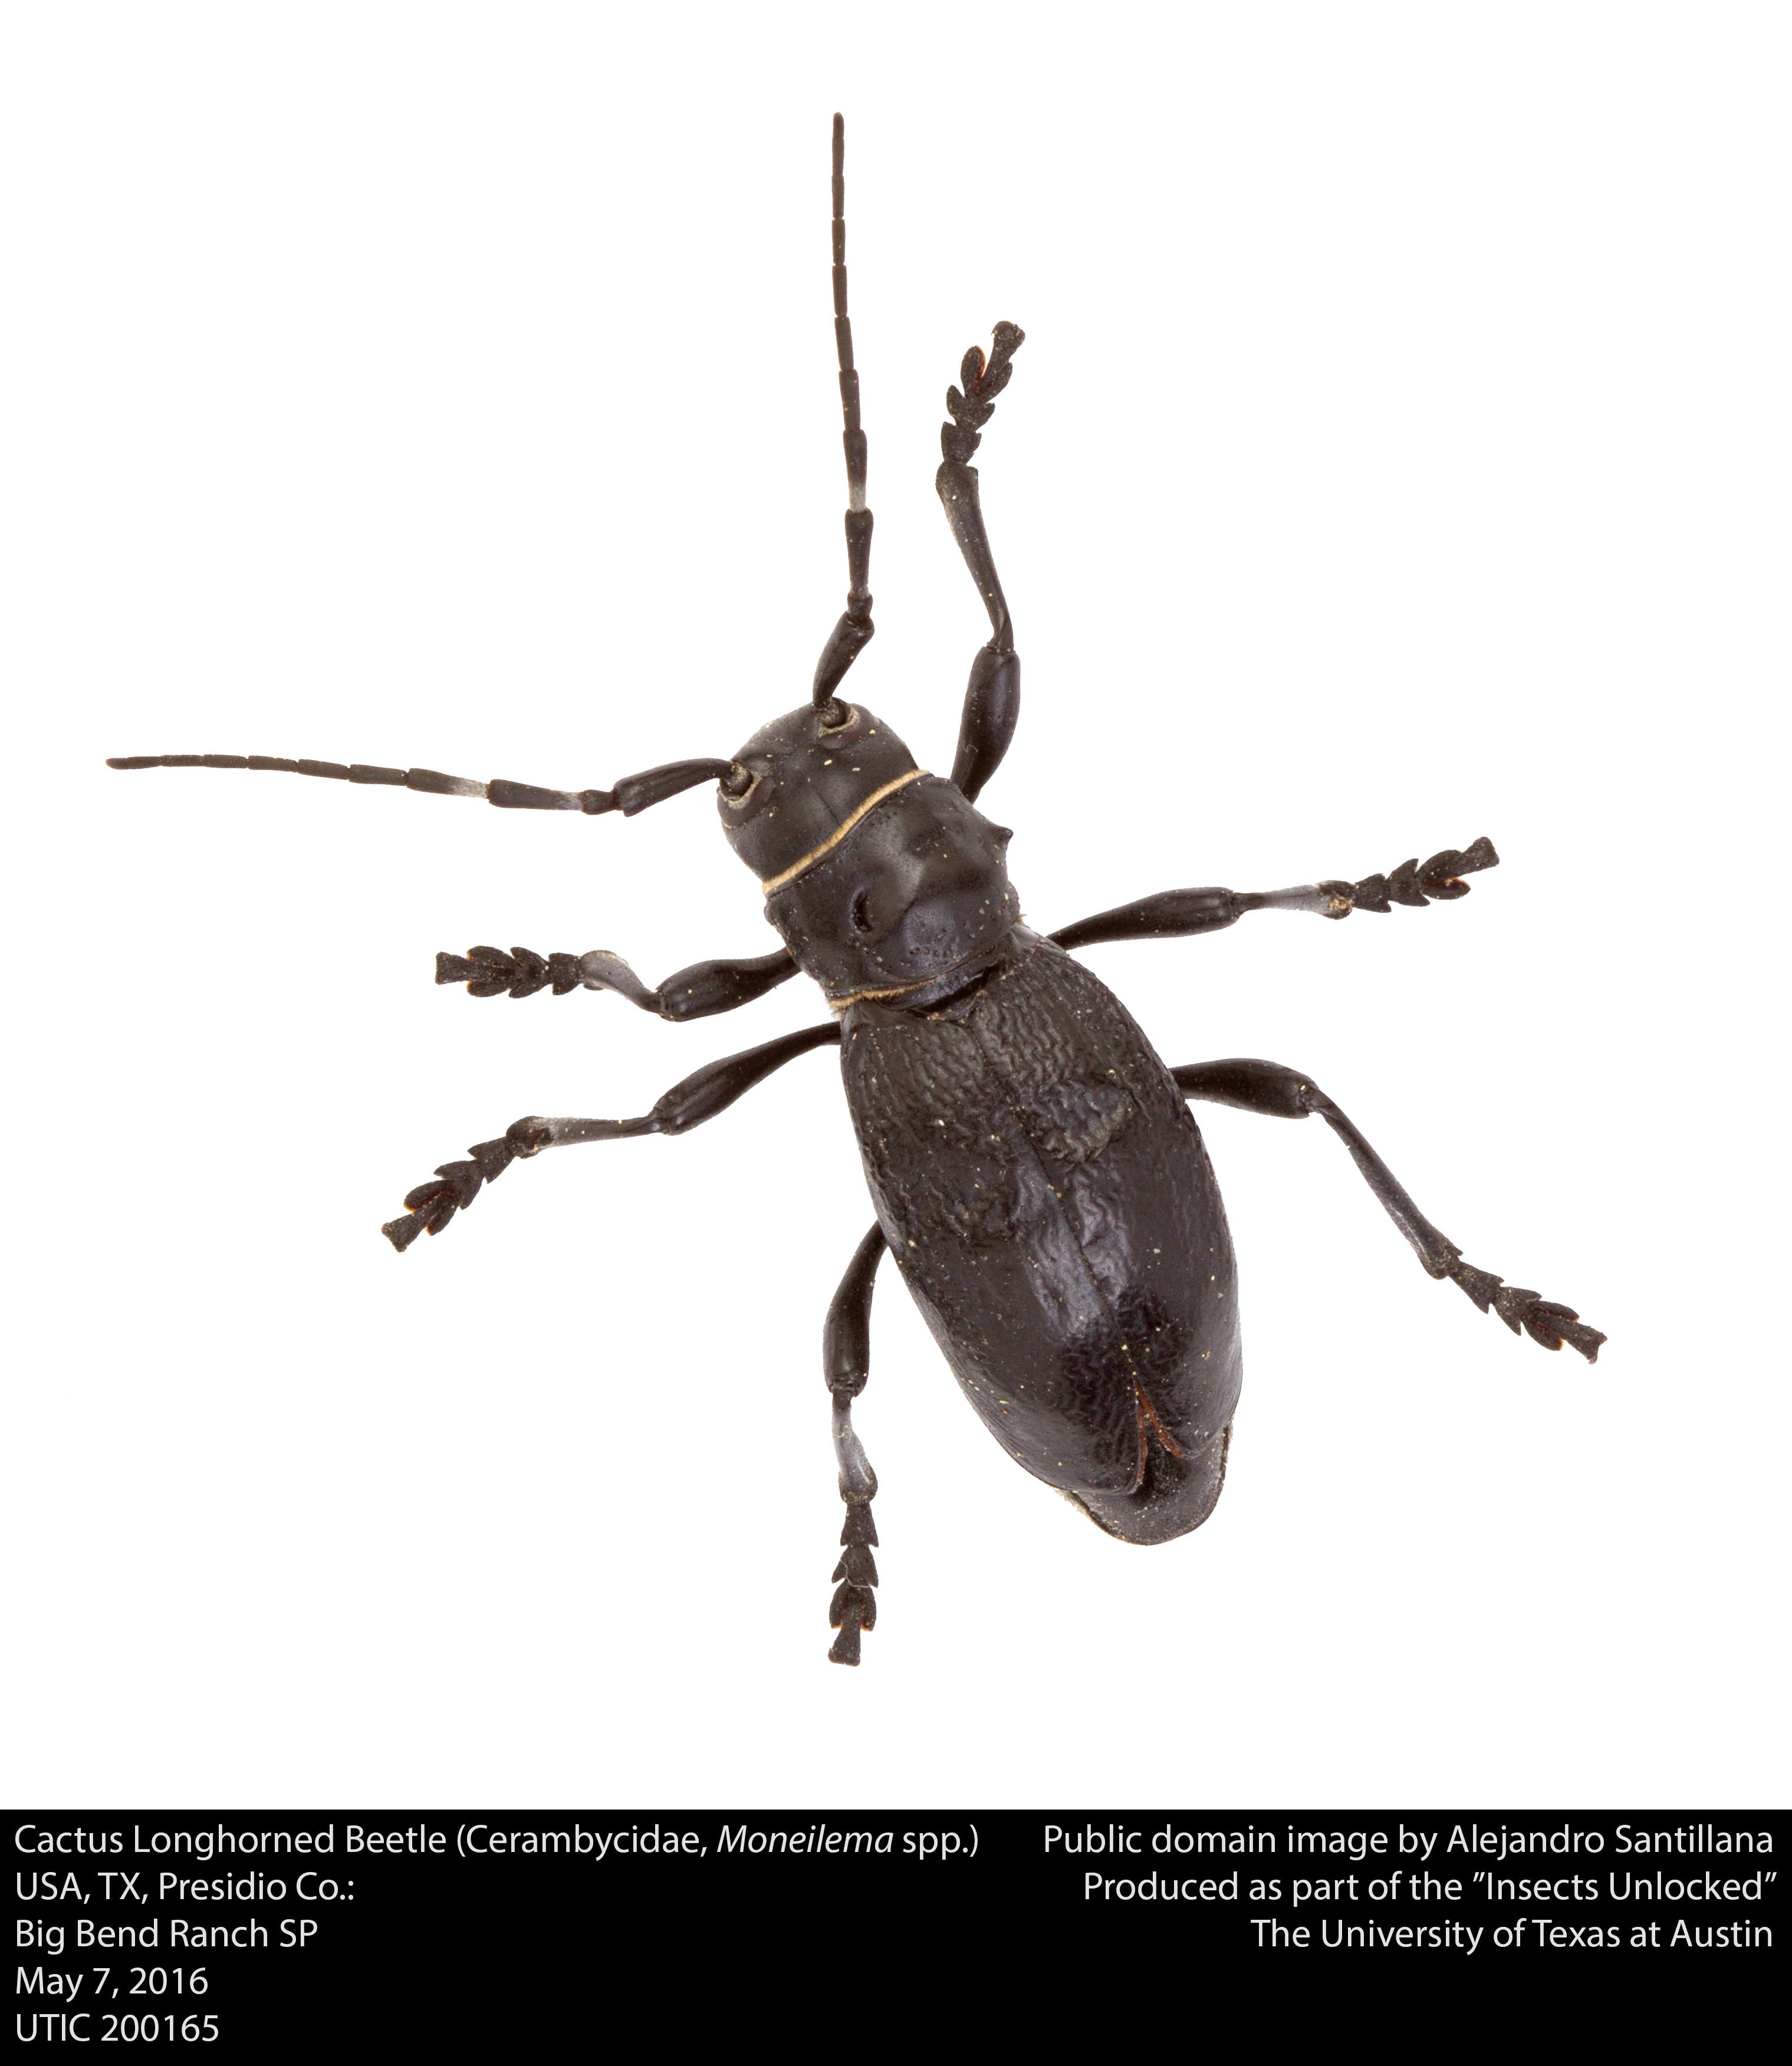 File:Cactus Longhorned Beetle (Cerambycidae, Moneilema spp ...